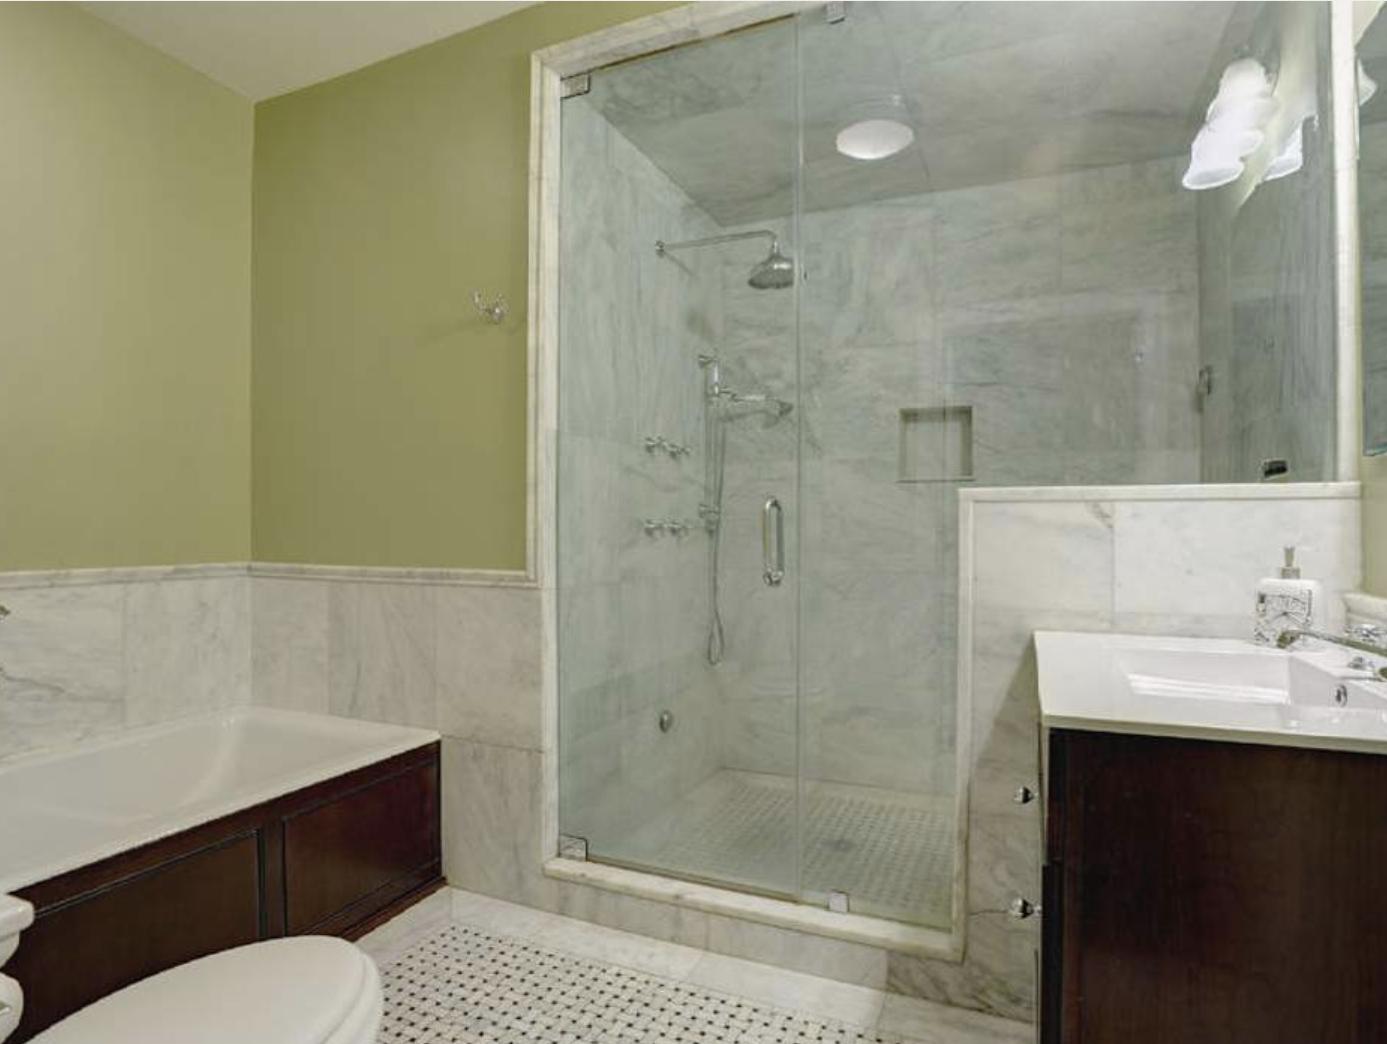 Sotheby's listing for 29 Howard St. Unit 4 bathroom